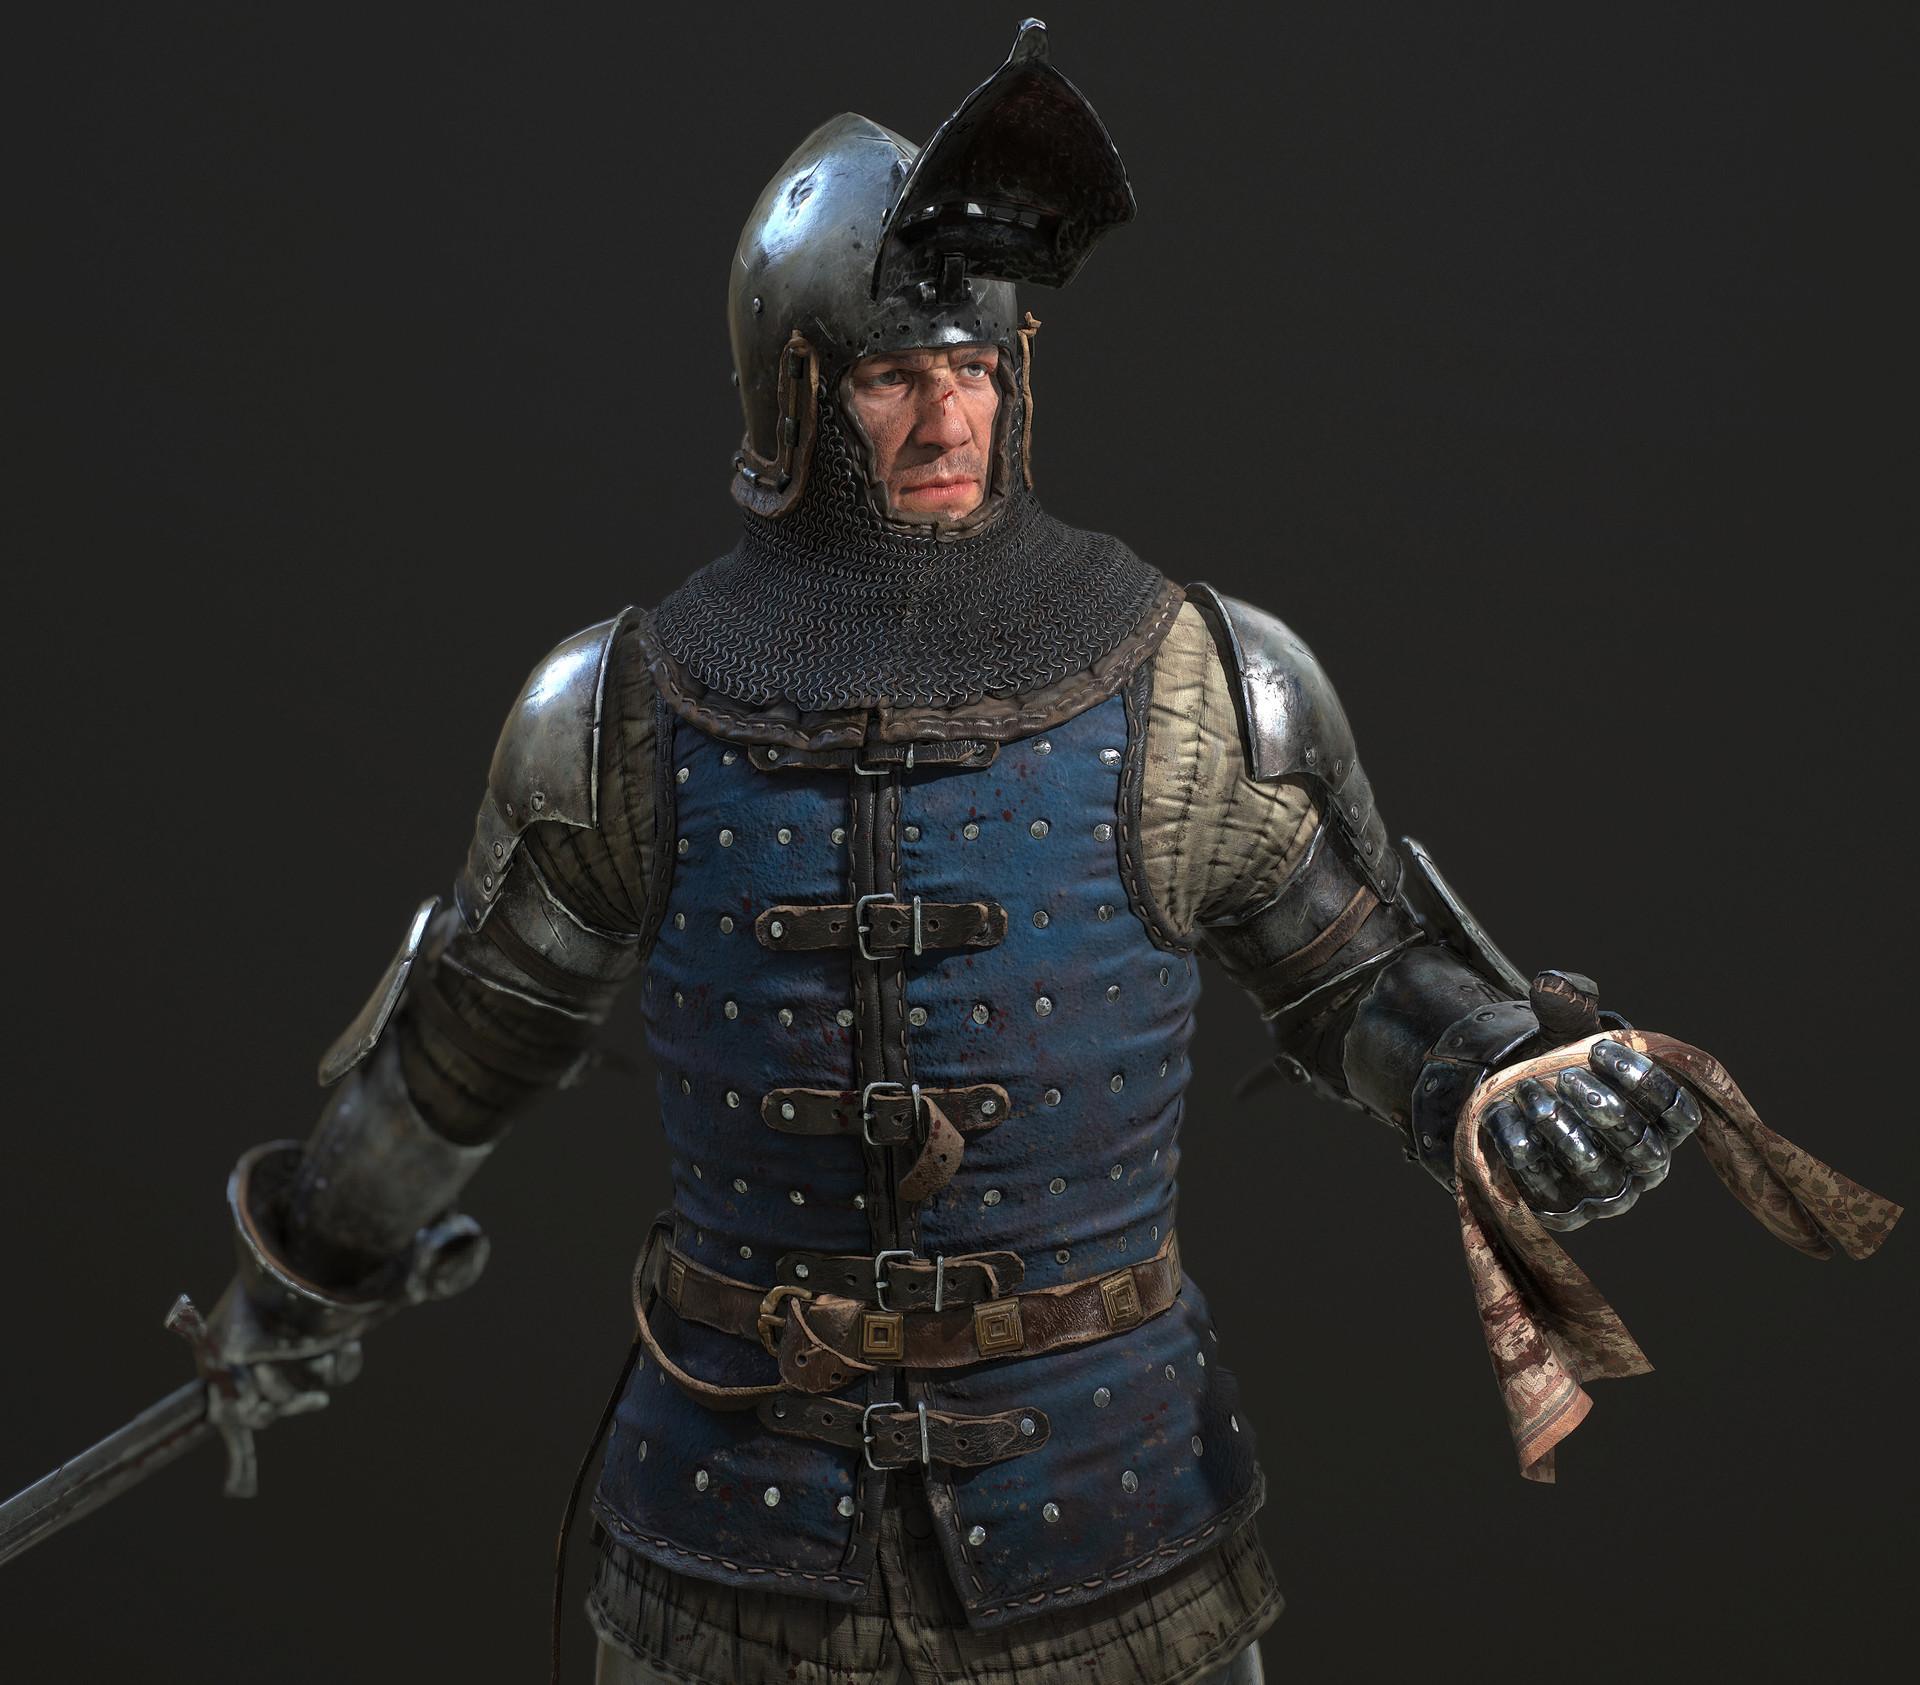 Petr sokolov artpity knight lp detail 04